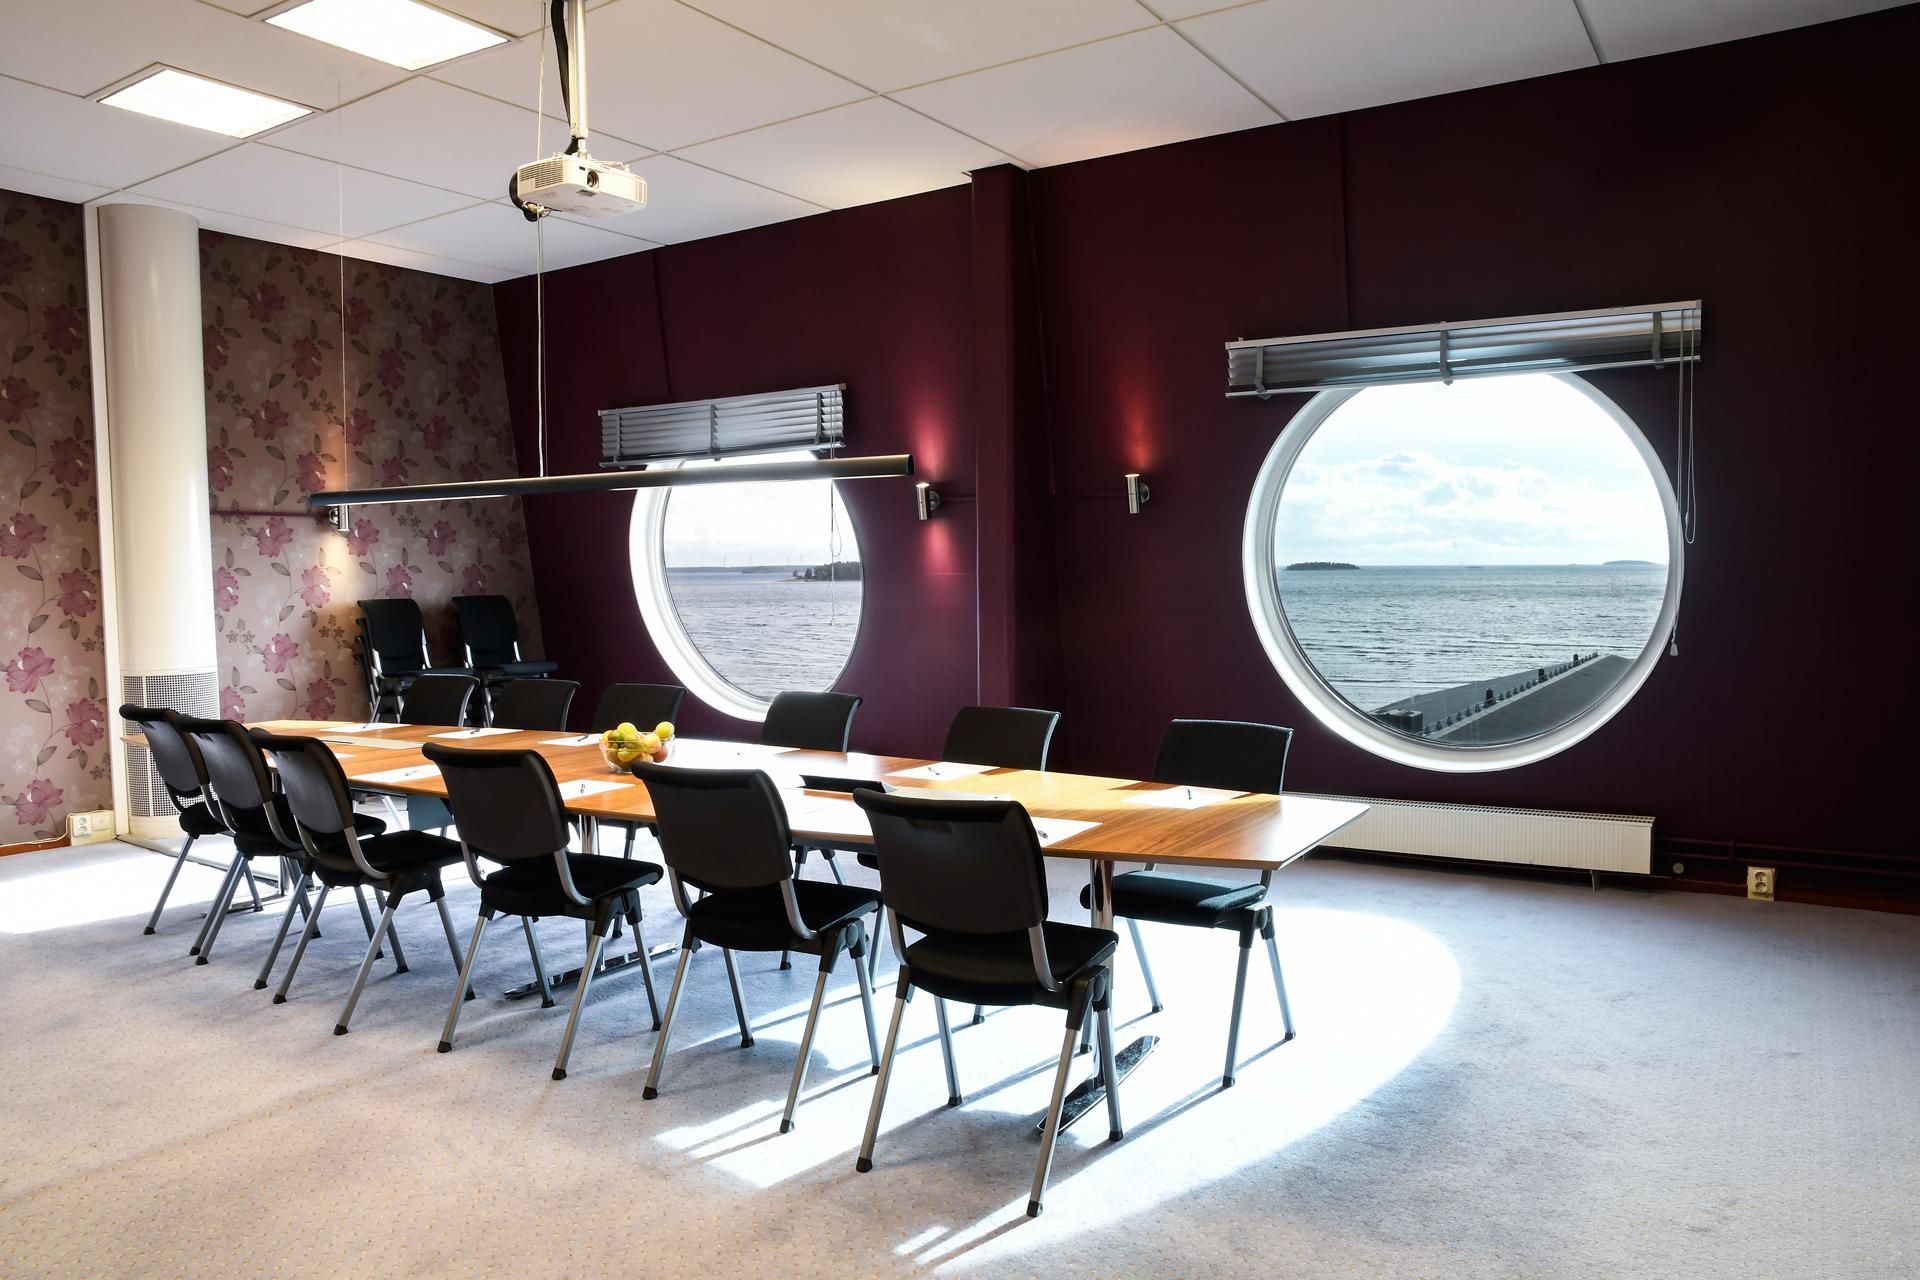 Konferensrum med havsutsikt - Pite Havsbad